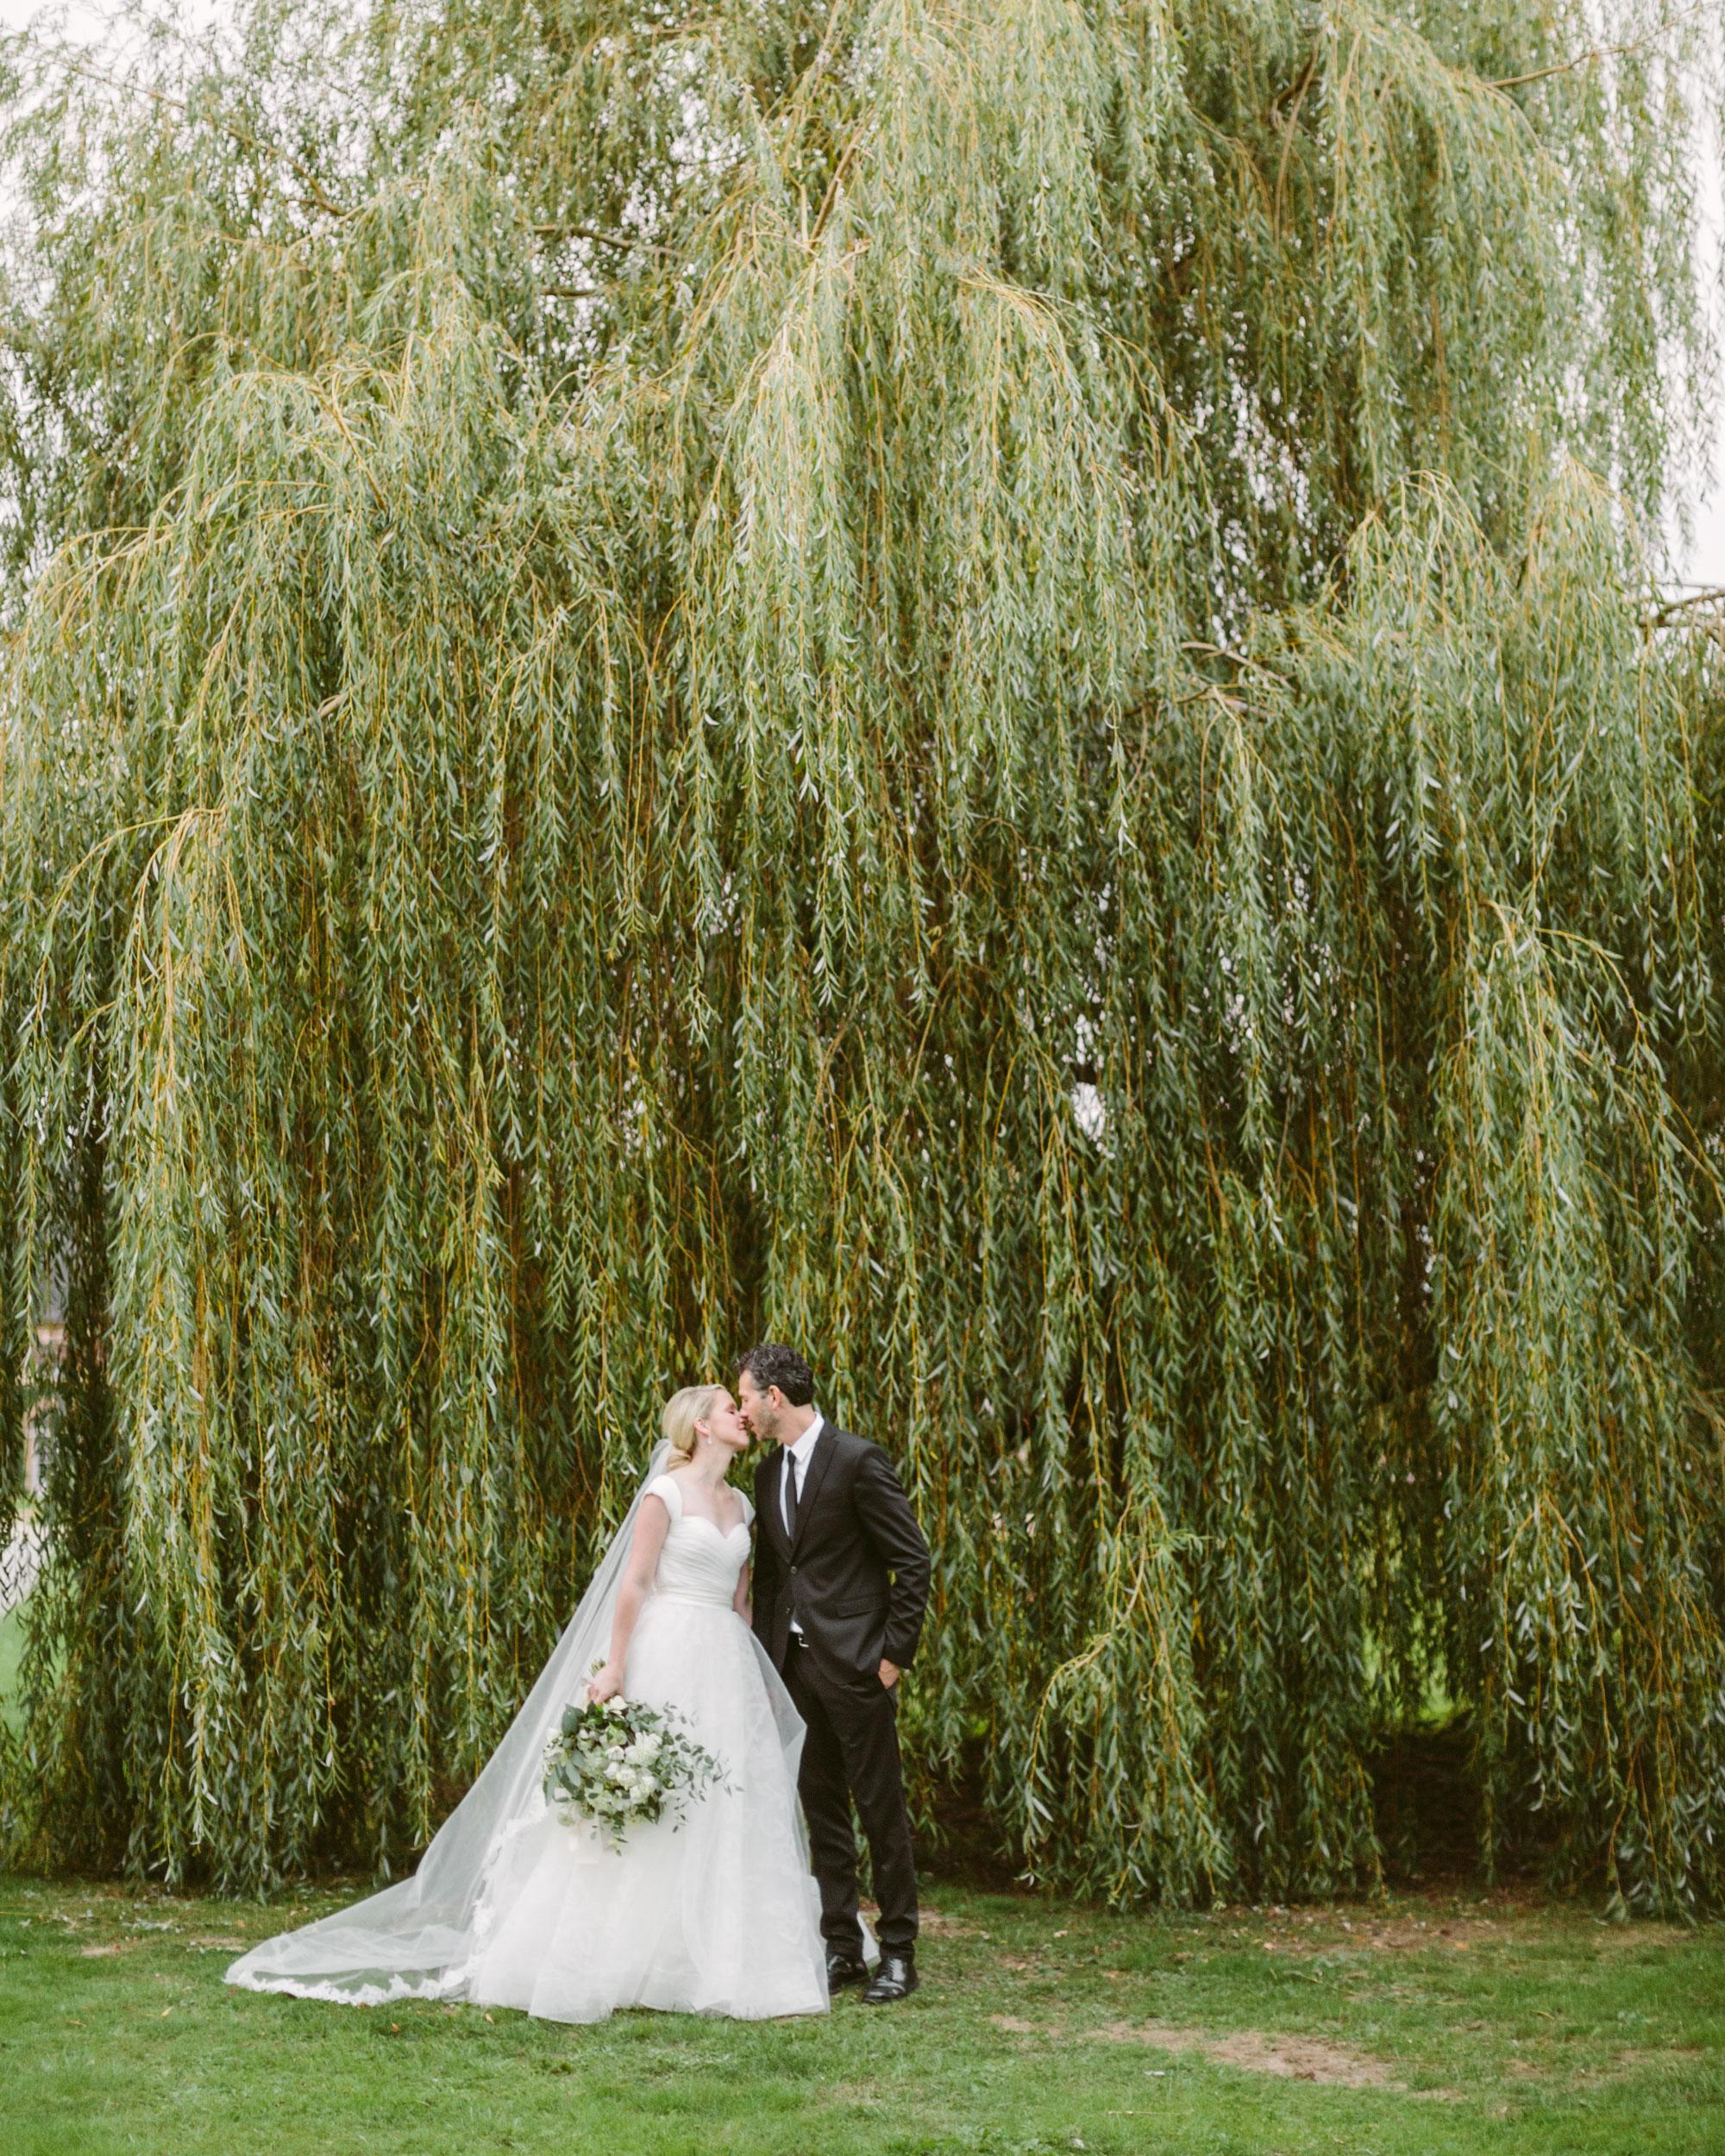 anneclaire-chris-wedding-france-couple-039-s113034-00716.jpg